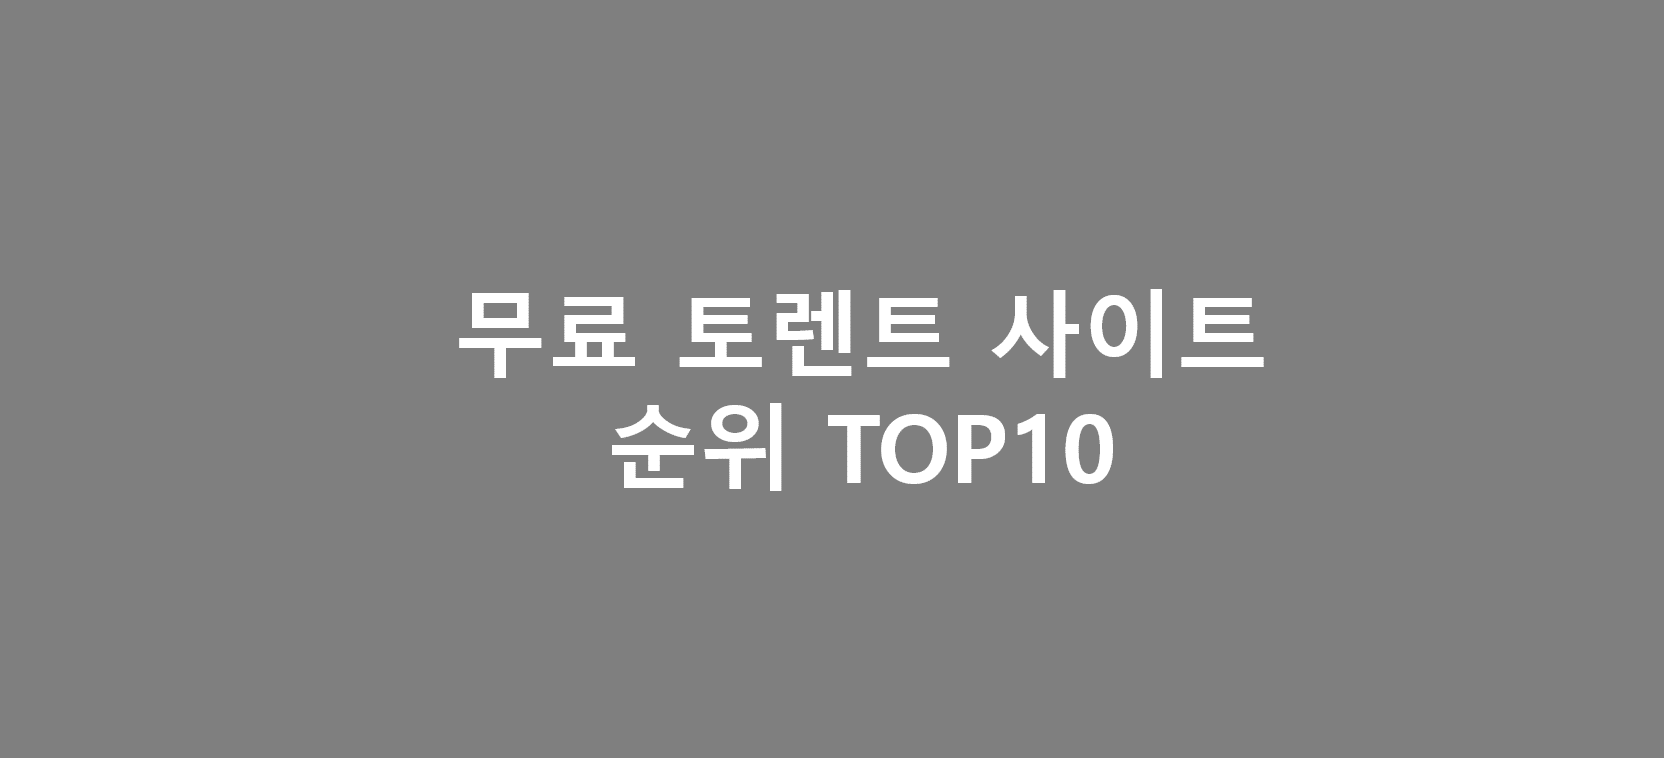 free torrent site ranktop logo